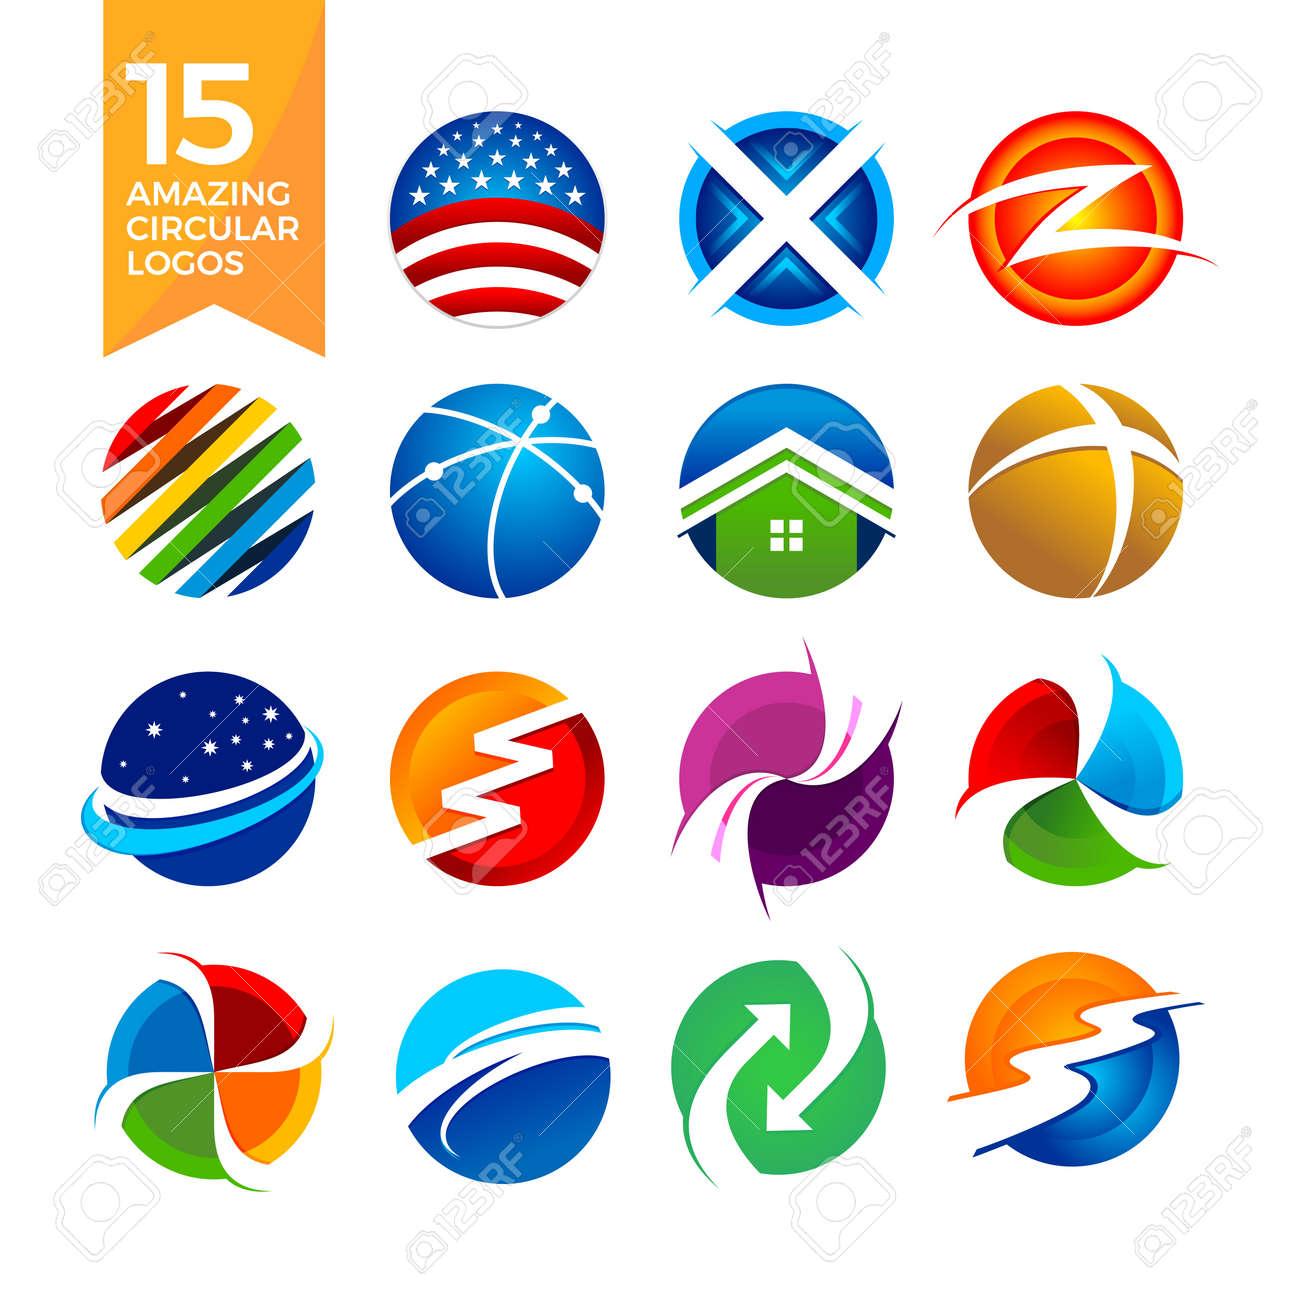 15 Amazing Circular Shape Logo Symbol Graphic Designs Royalty Free